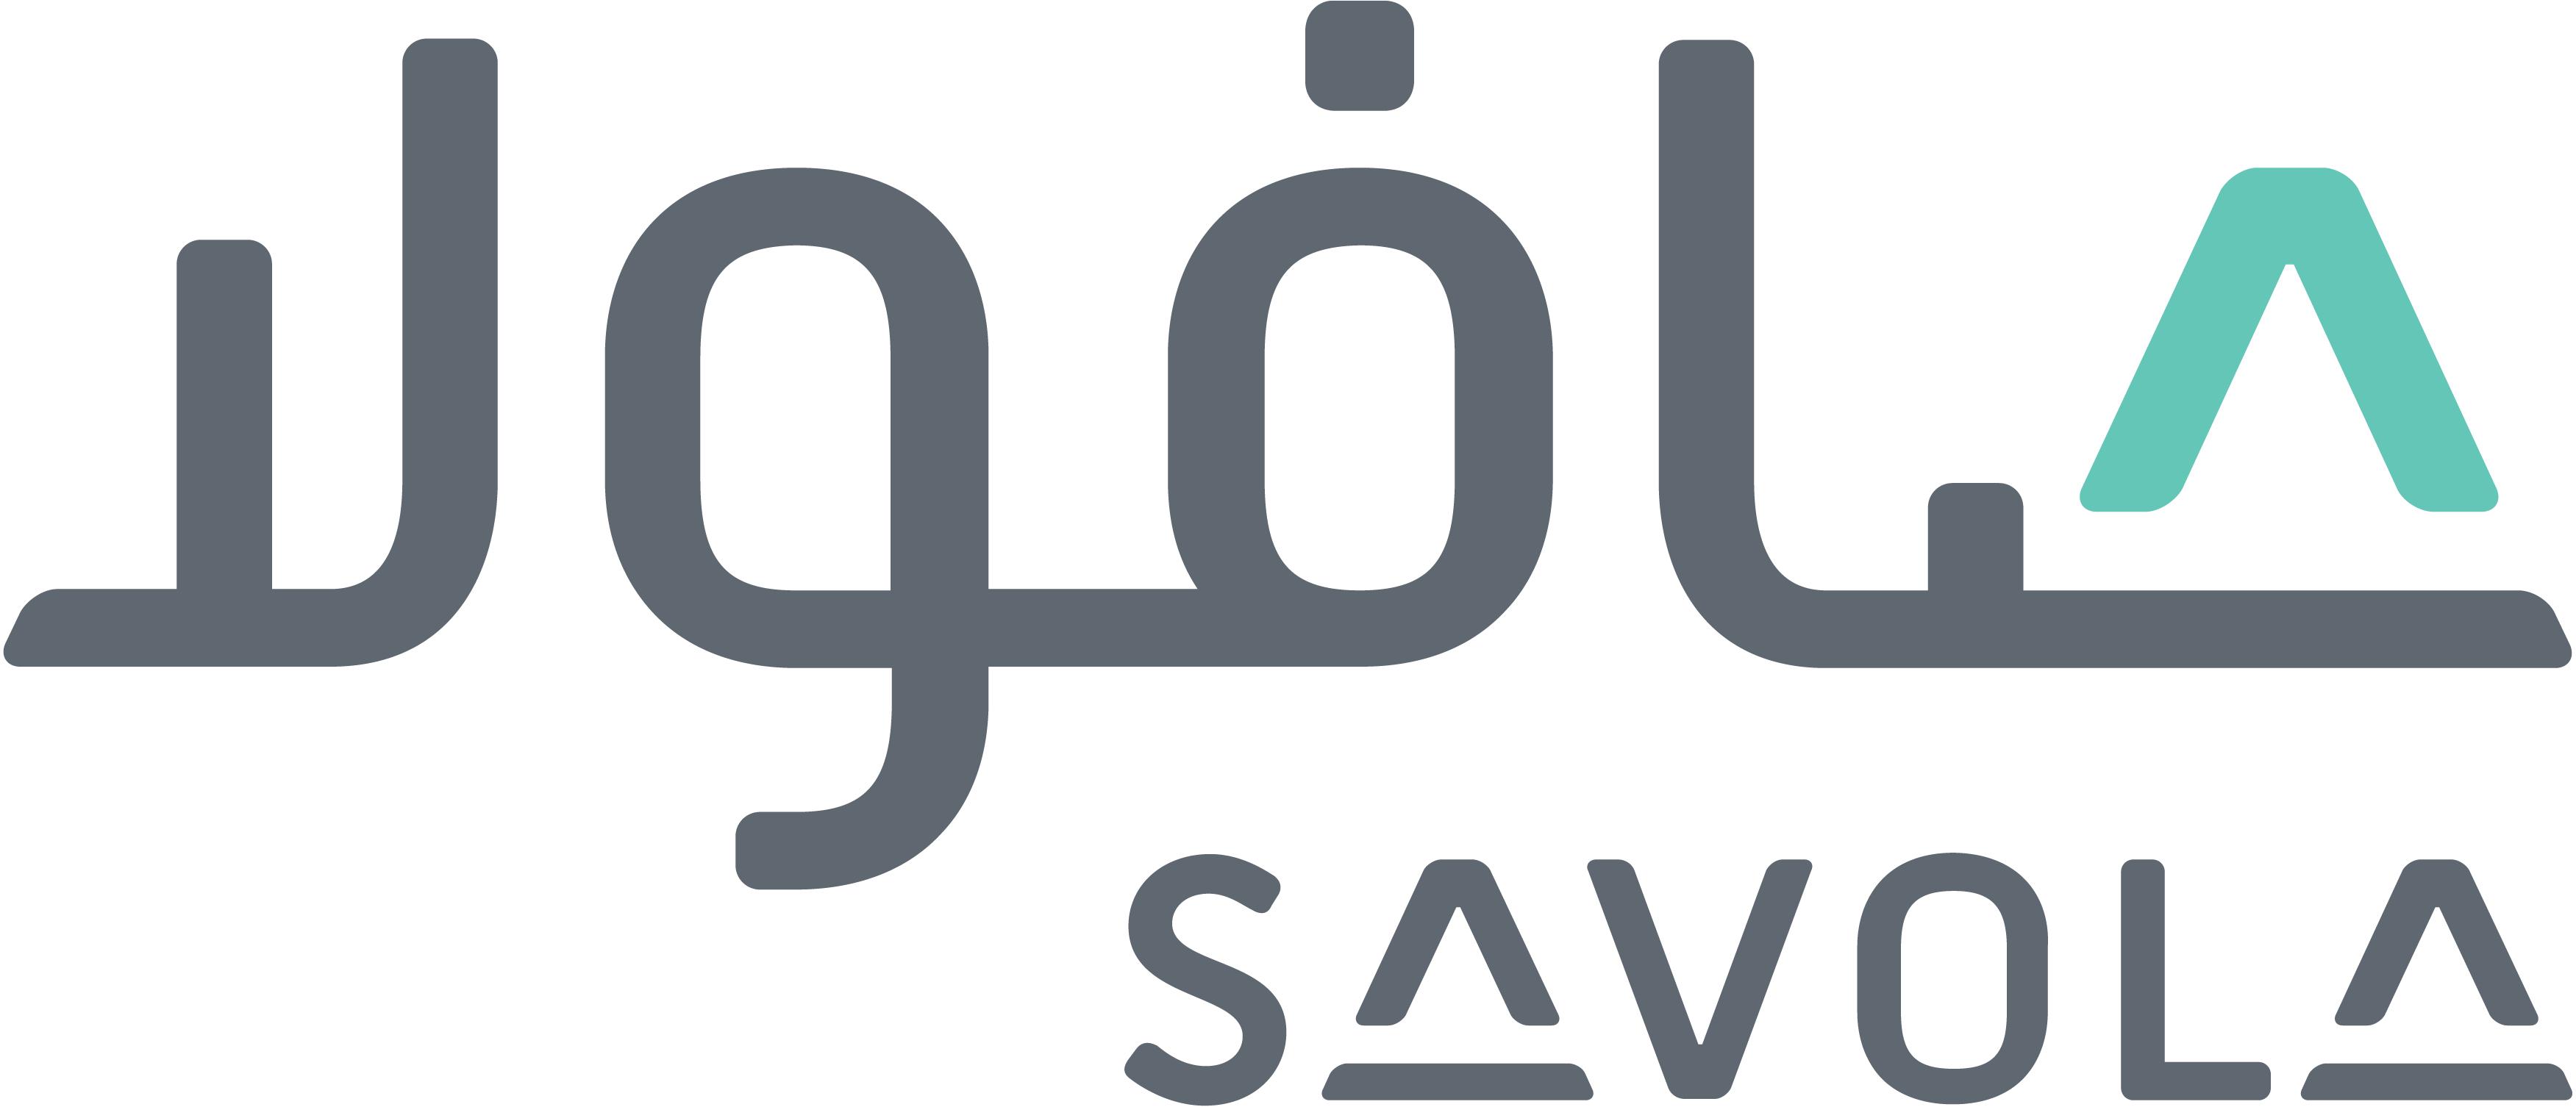 the savola group logo